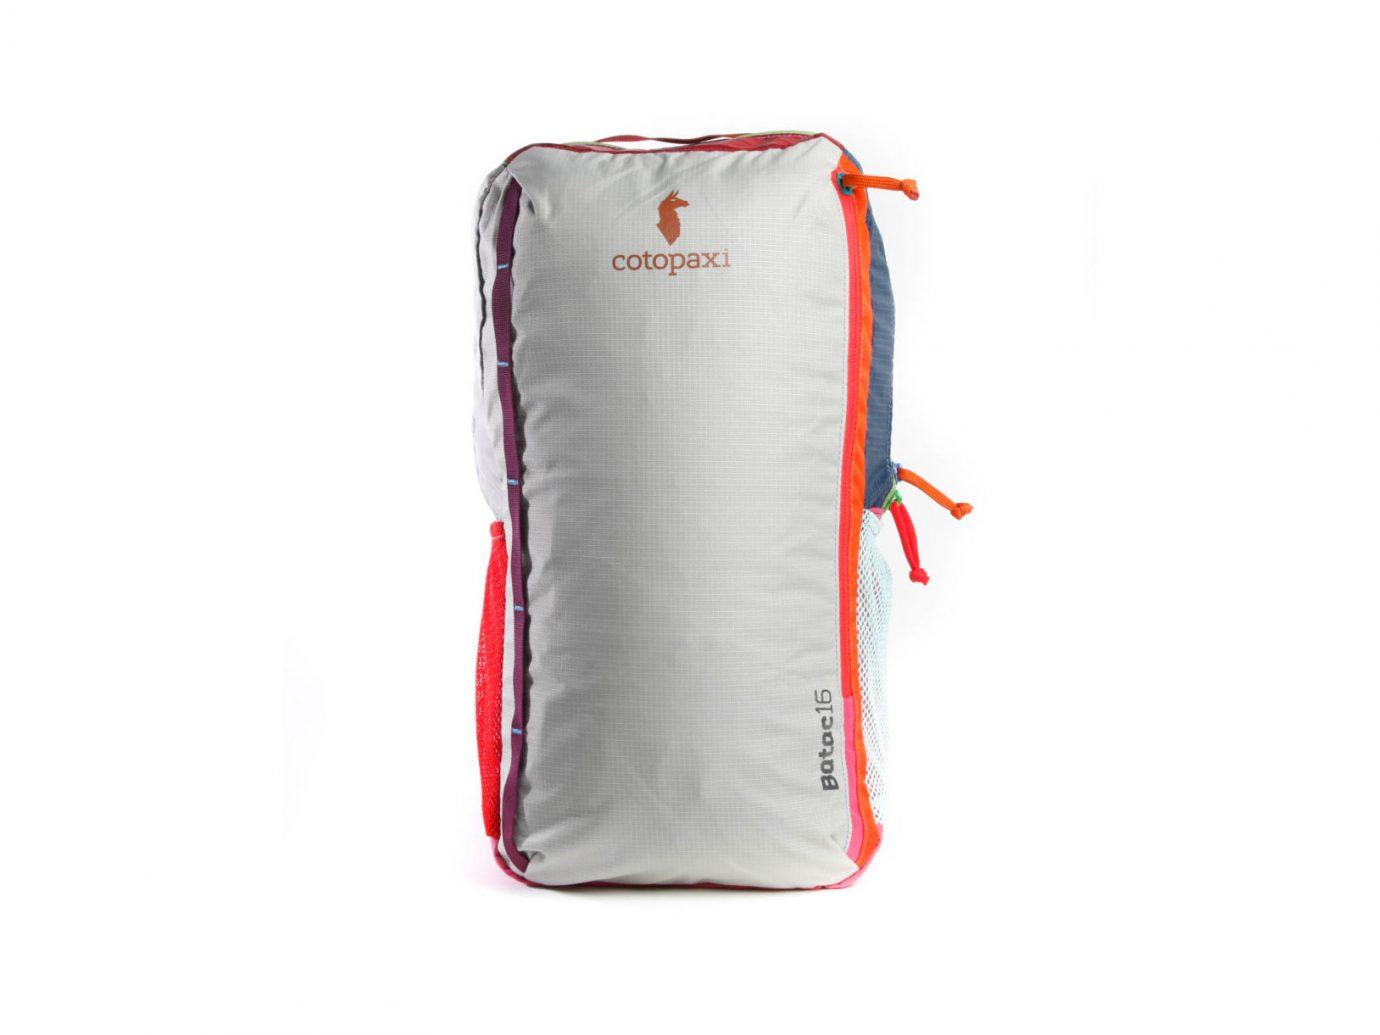 Cotopaxi Batac Del Día 16L Backpack